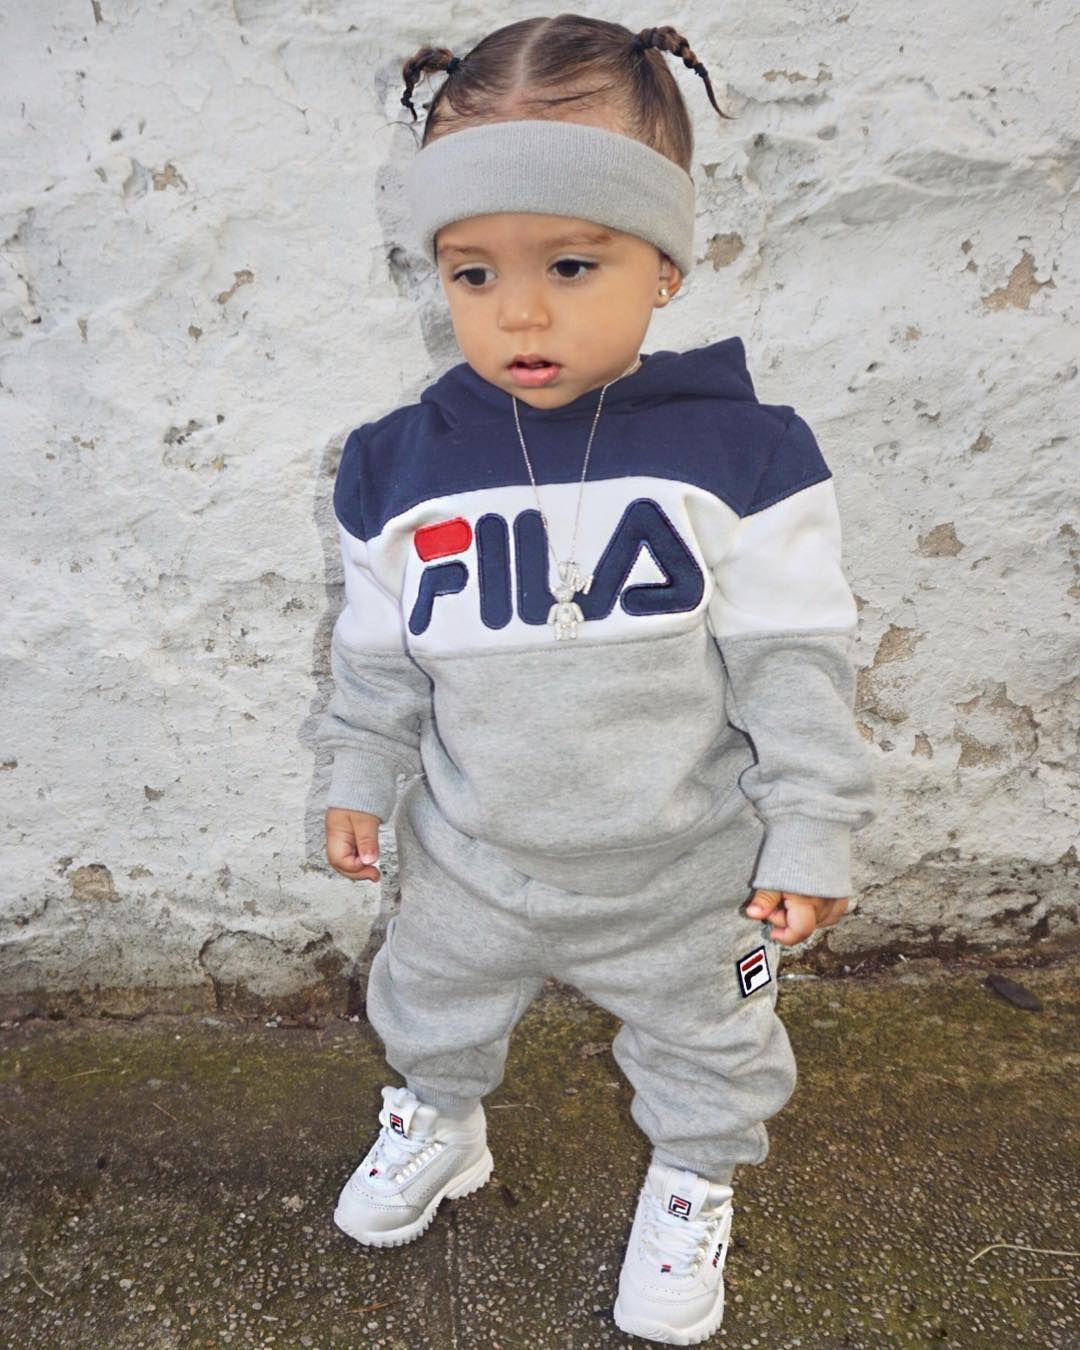 Masons World On Instagram Chill Vibes Baby Boy Swag